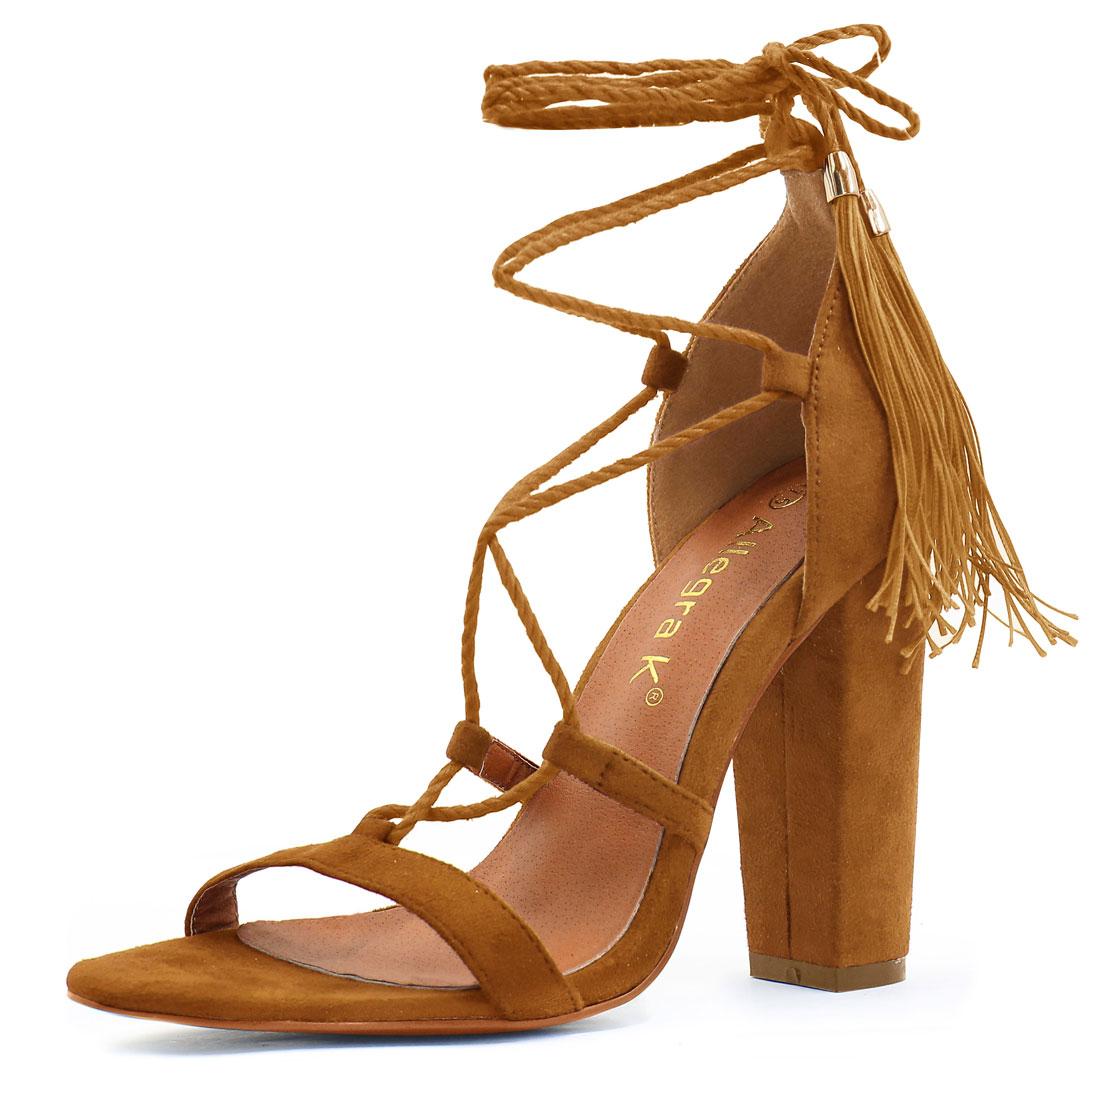 Women Chunky High Heel Tassel Closure Lace Up Sandals Camel US 10.5